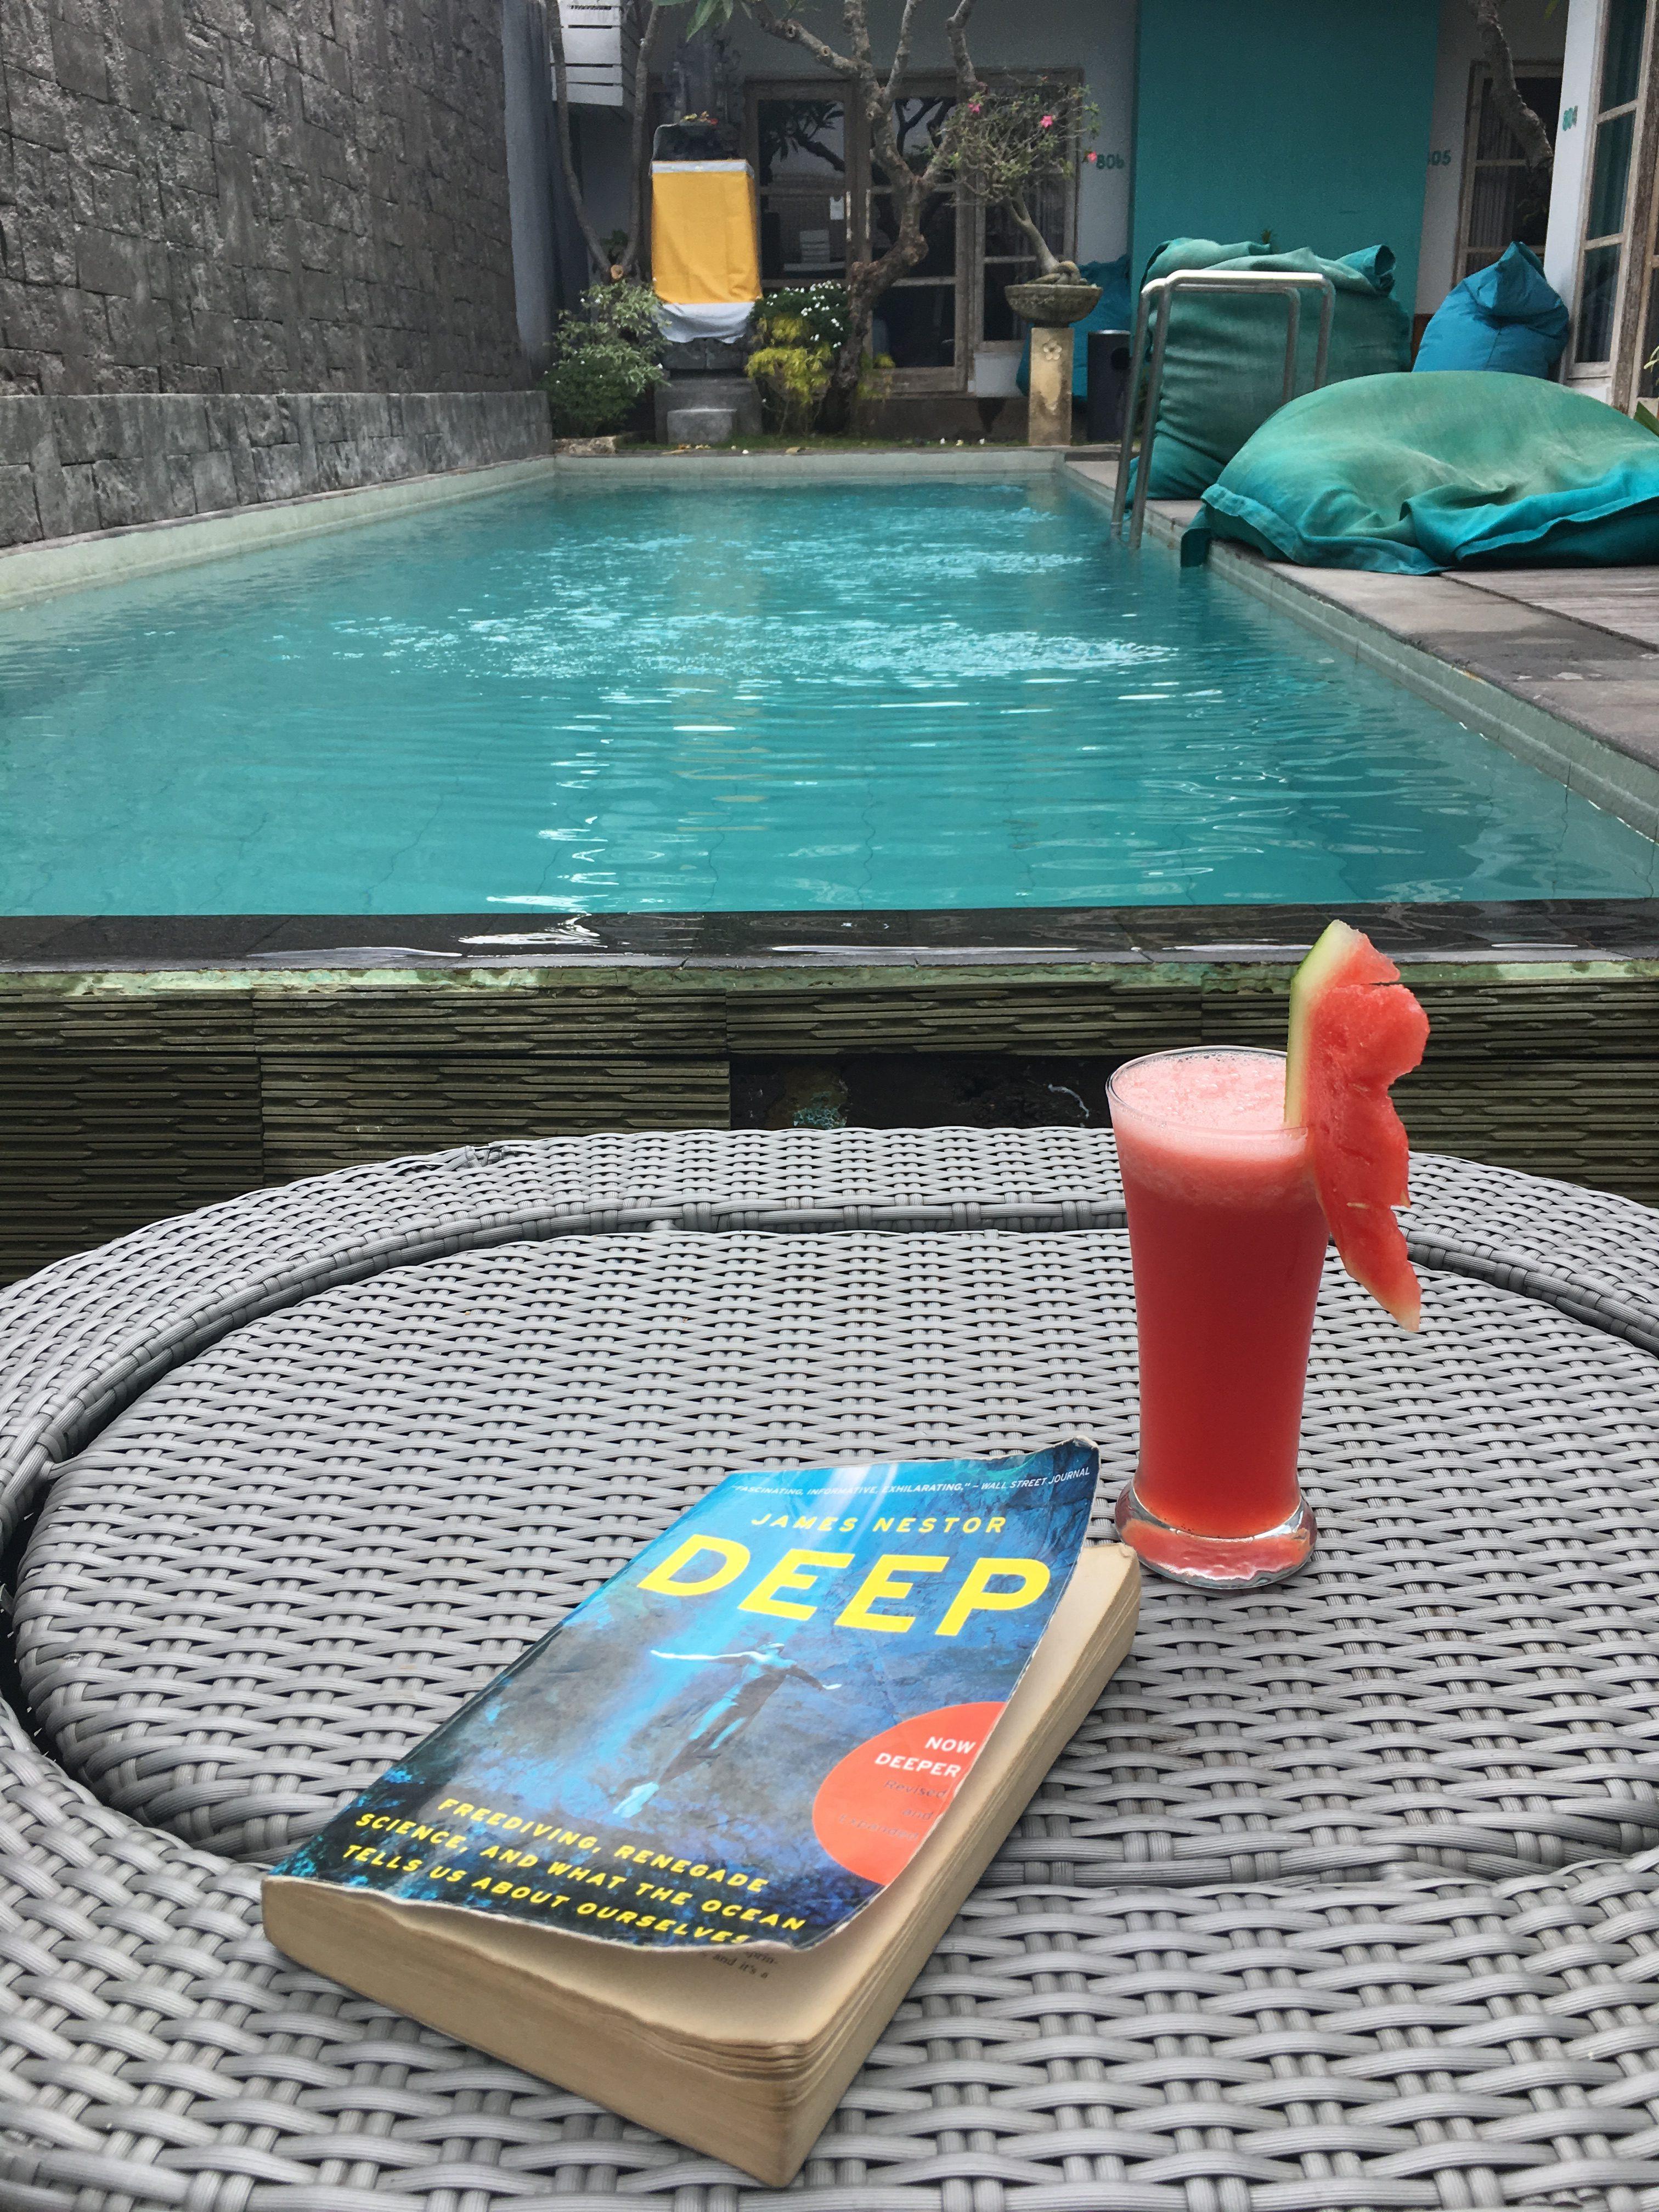 Hydrate, read, sunbathe, repeat.